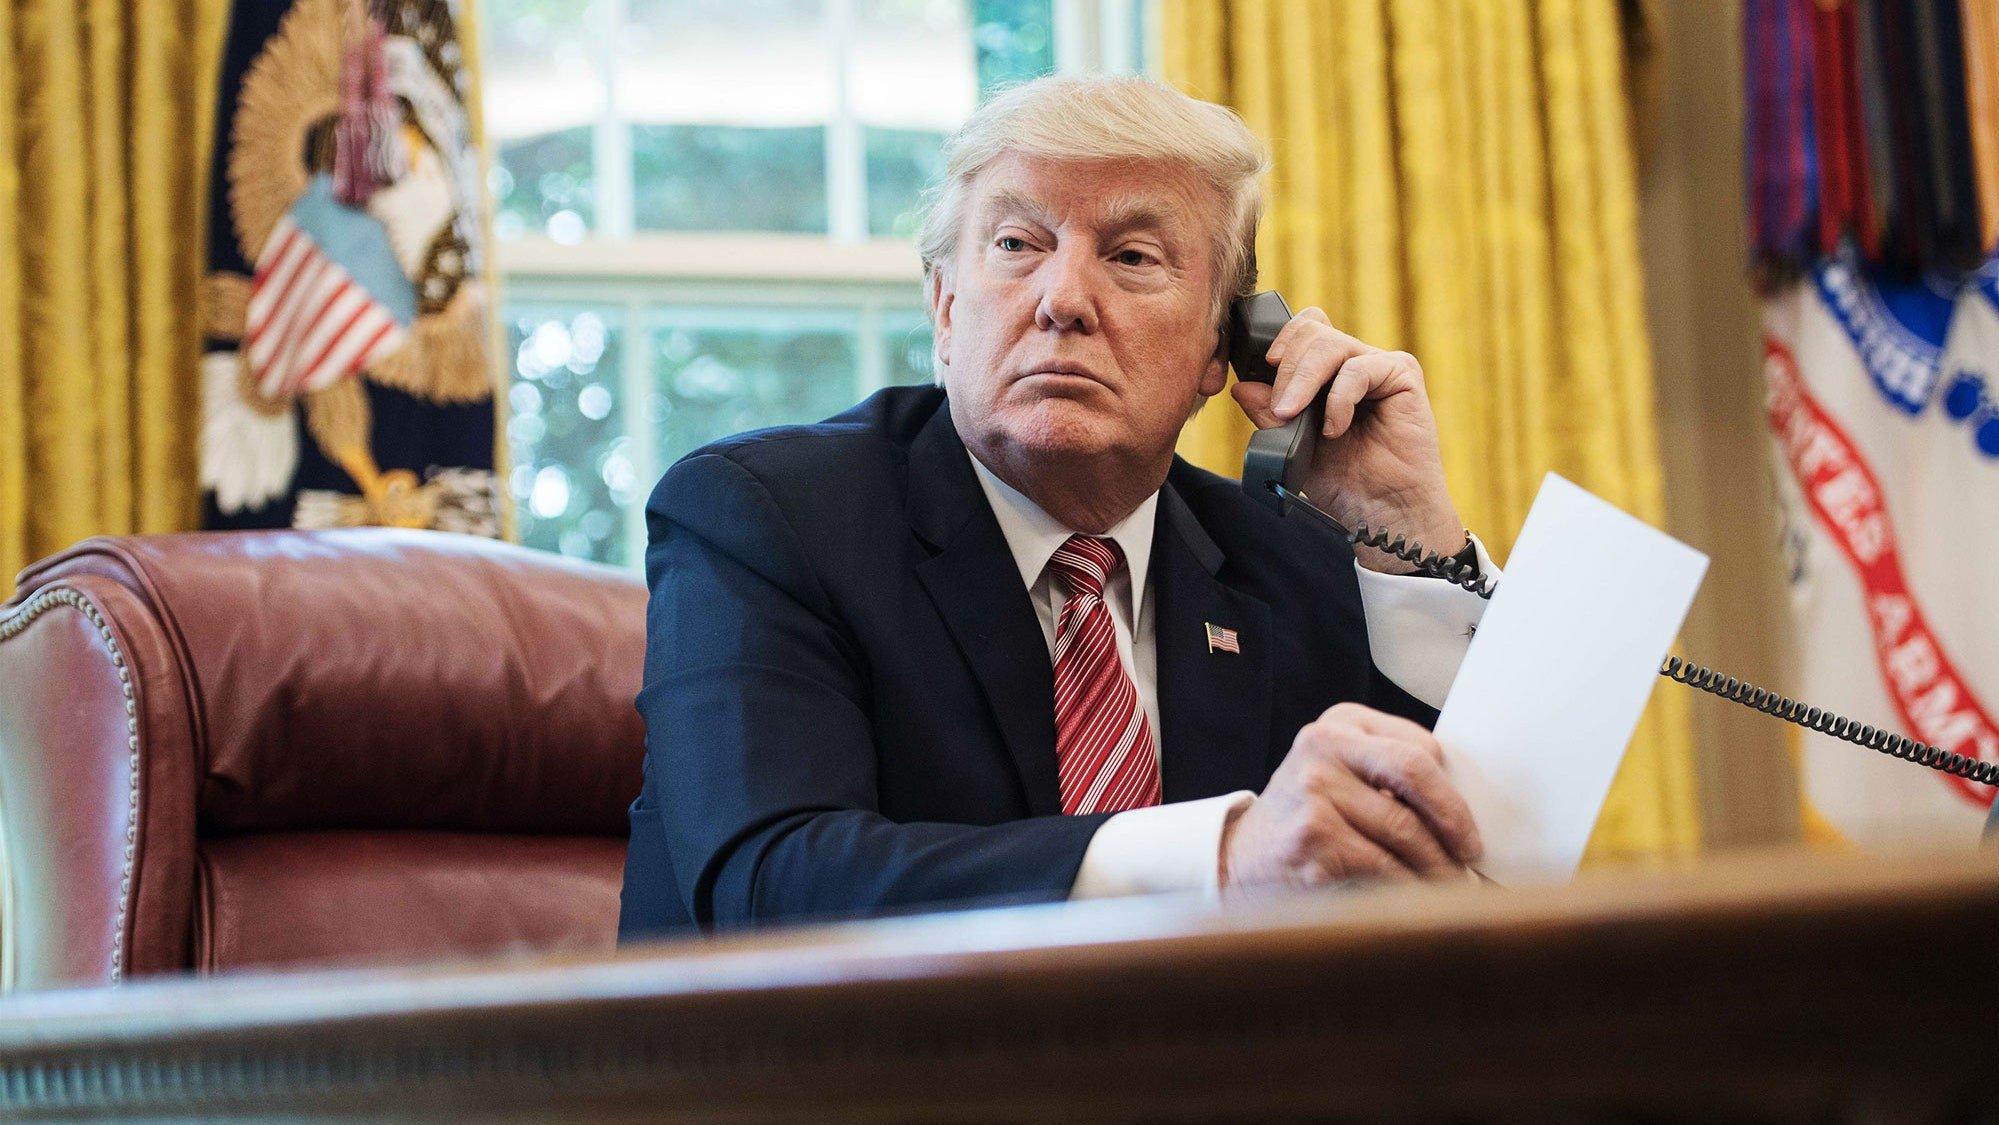 CNN: Ο Ερντογάν τηλεφωνούσε στον Τραμπ ότι ώρα ήθελε